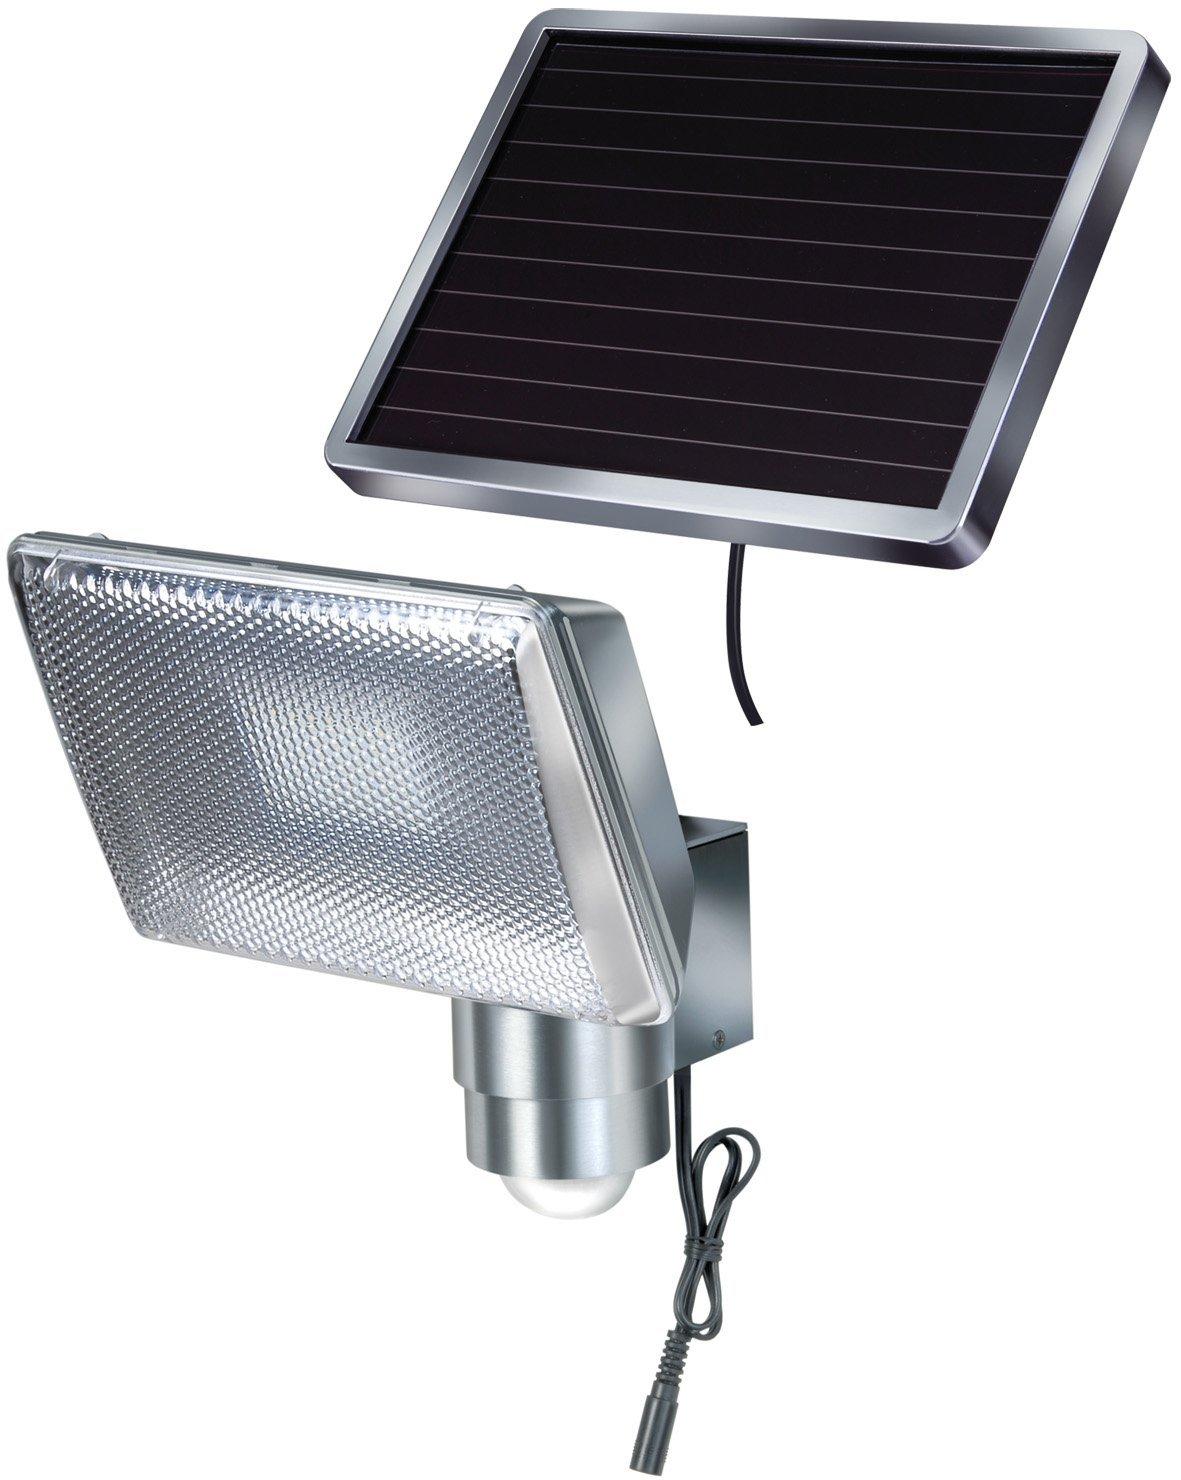 brennenstuhl sol 80 alu ip44 solar led strahler infrarot. Black Bedroom Furniture Sets. Home Design Ideas